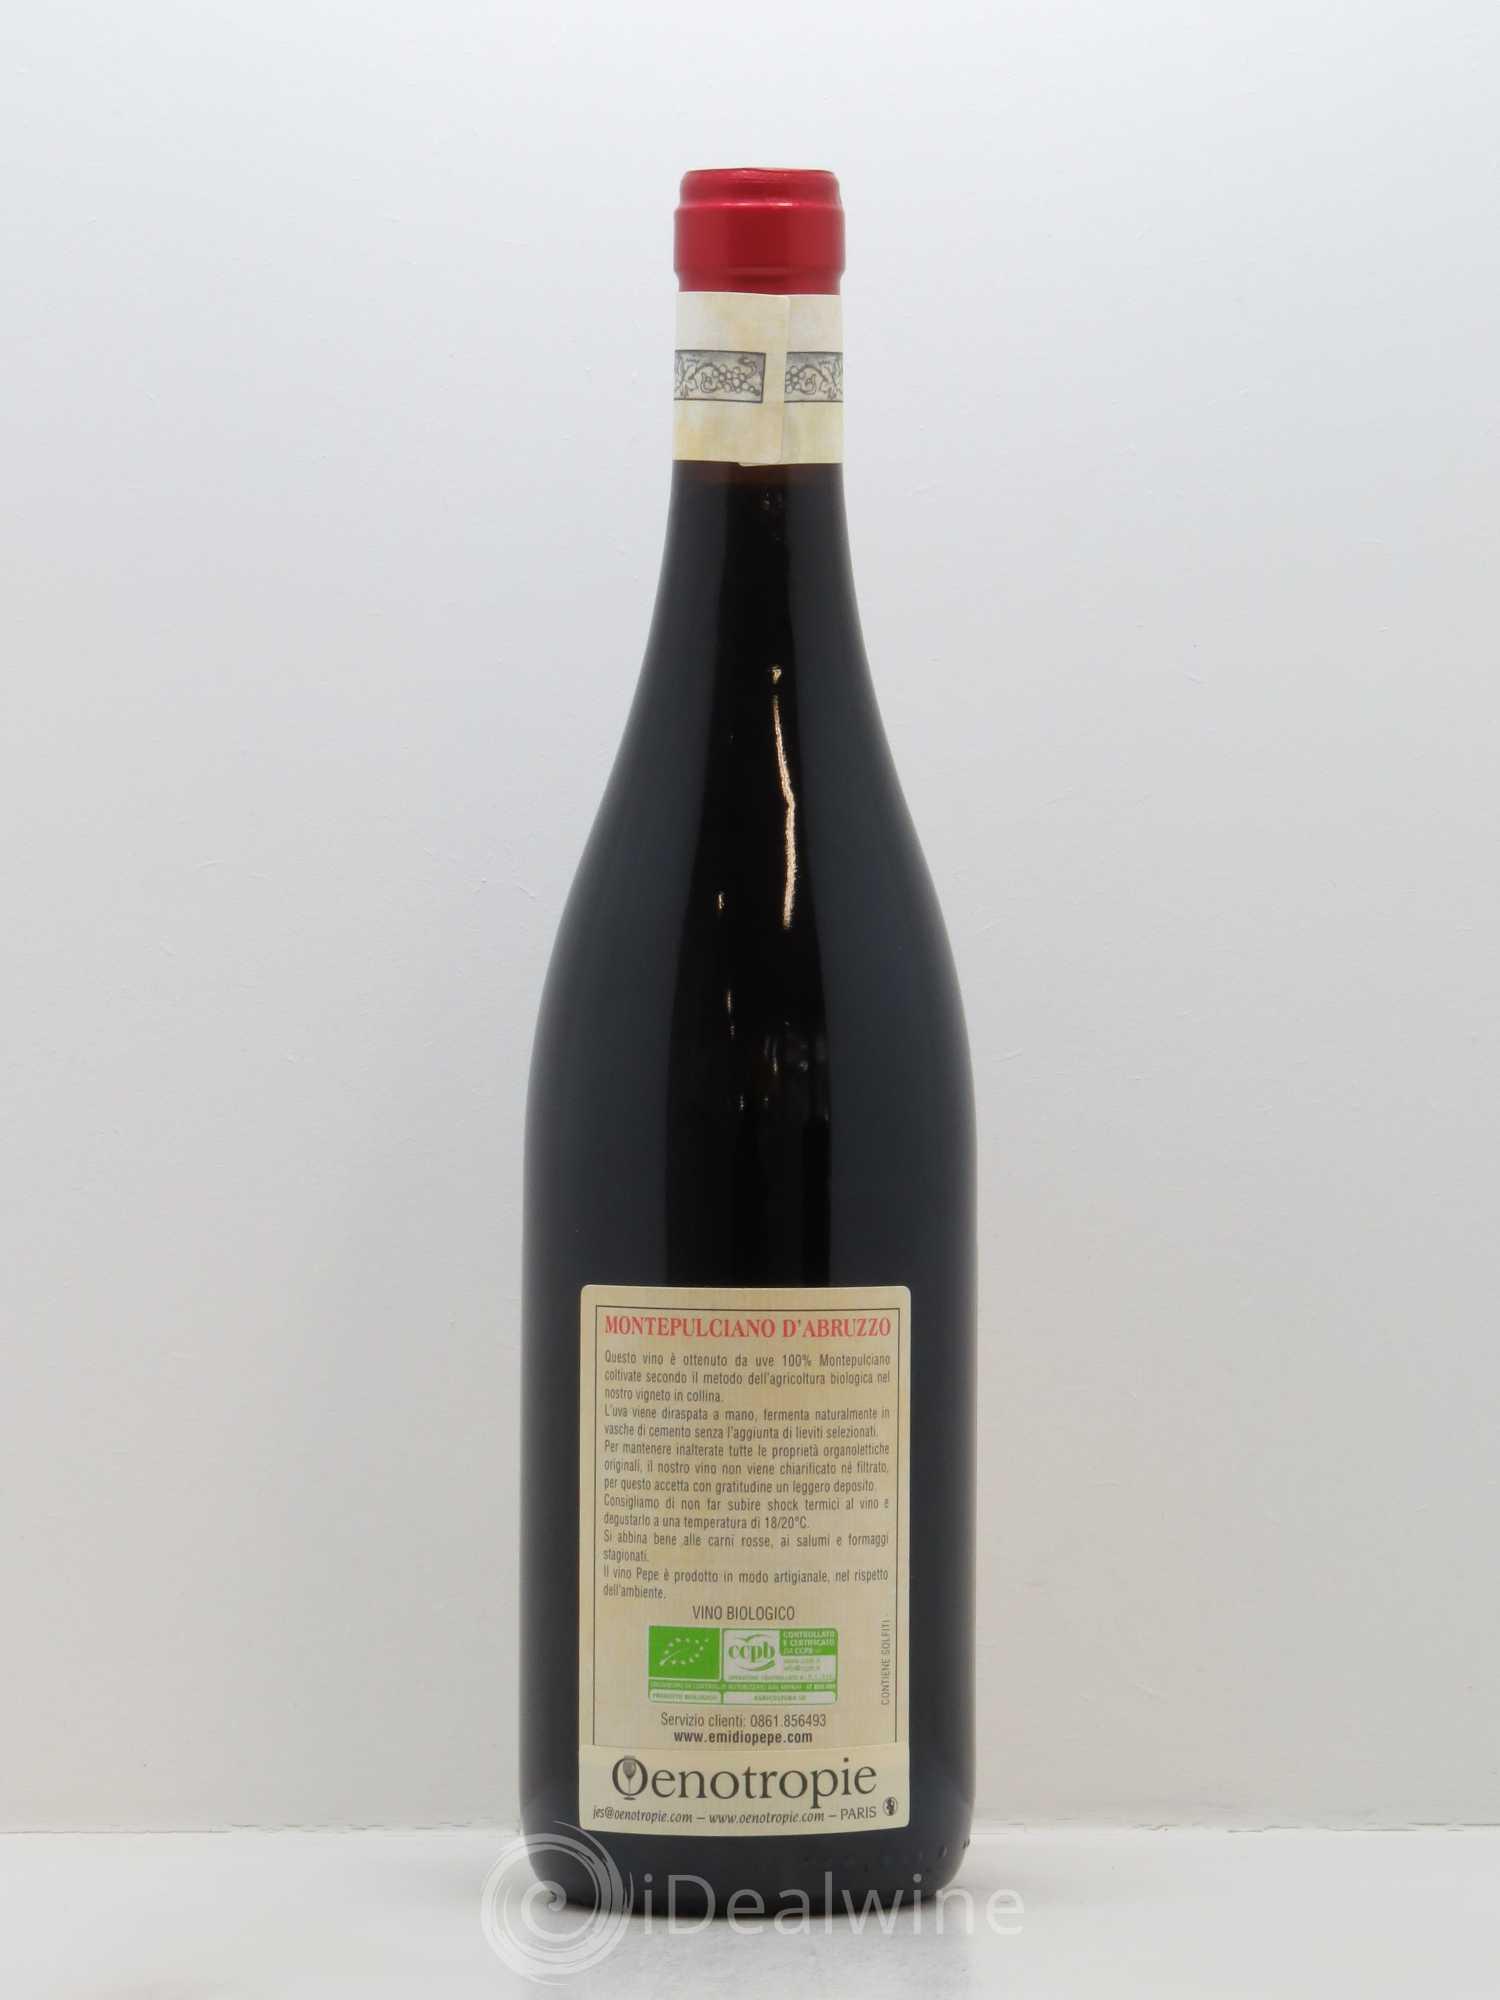 Acheter Une Maison En Italie Abruzzes montepulciano d'abruzzo doc emidio pepe 2014